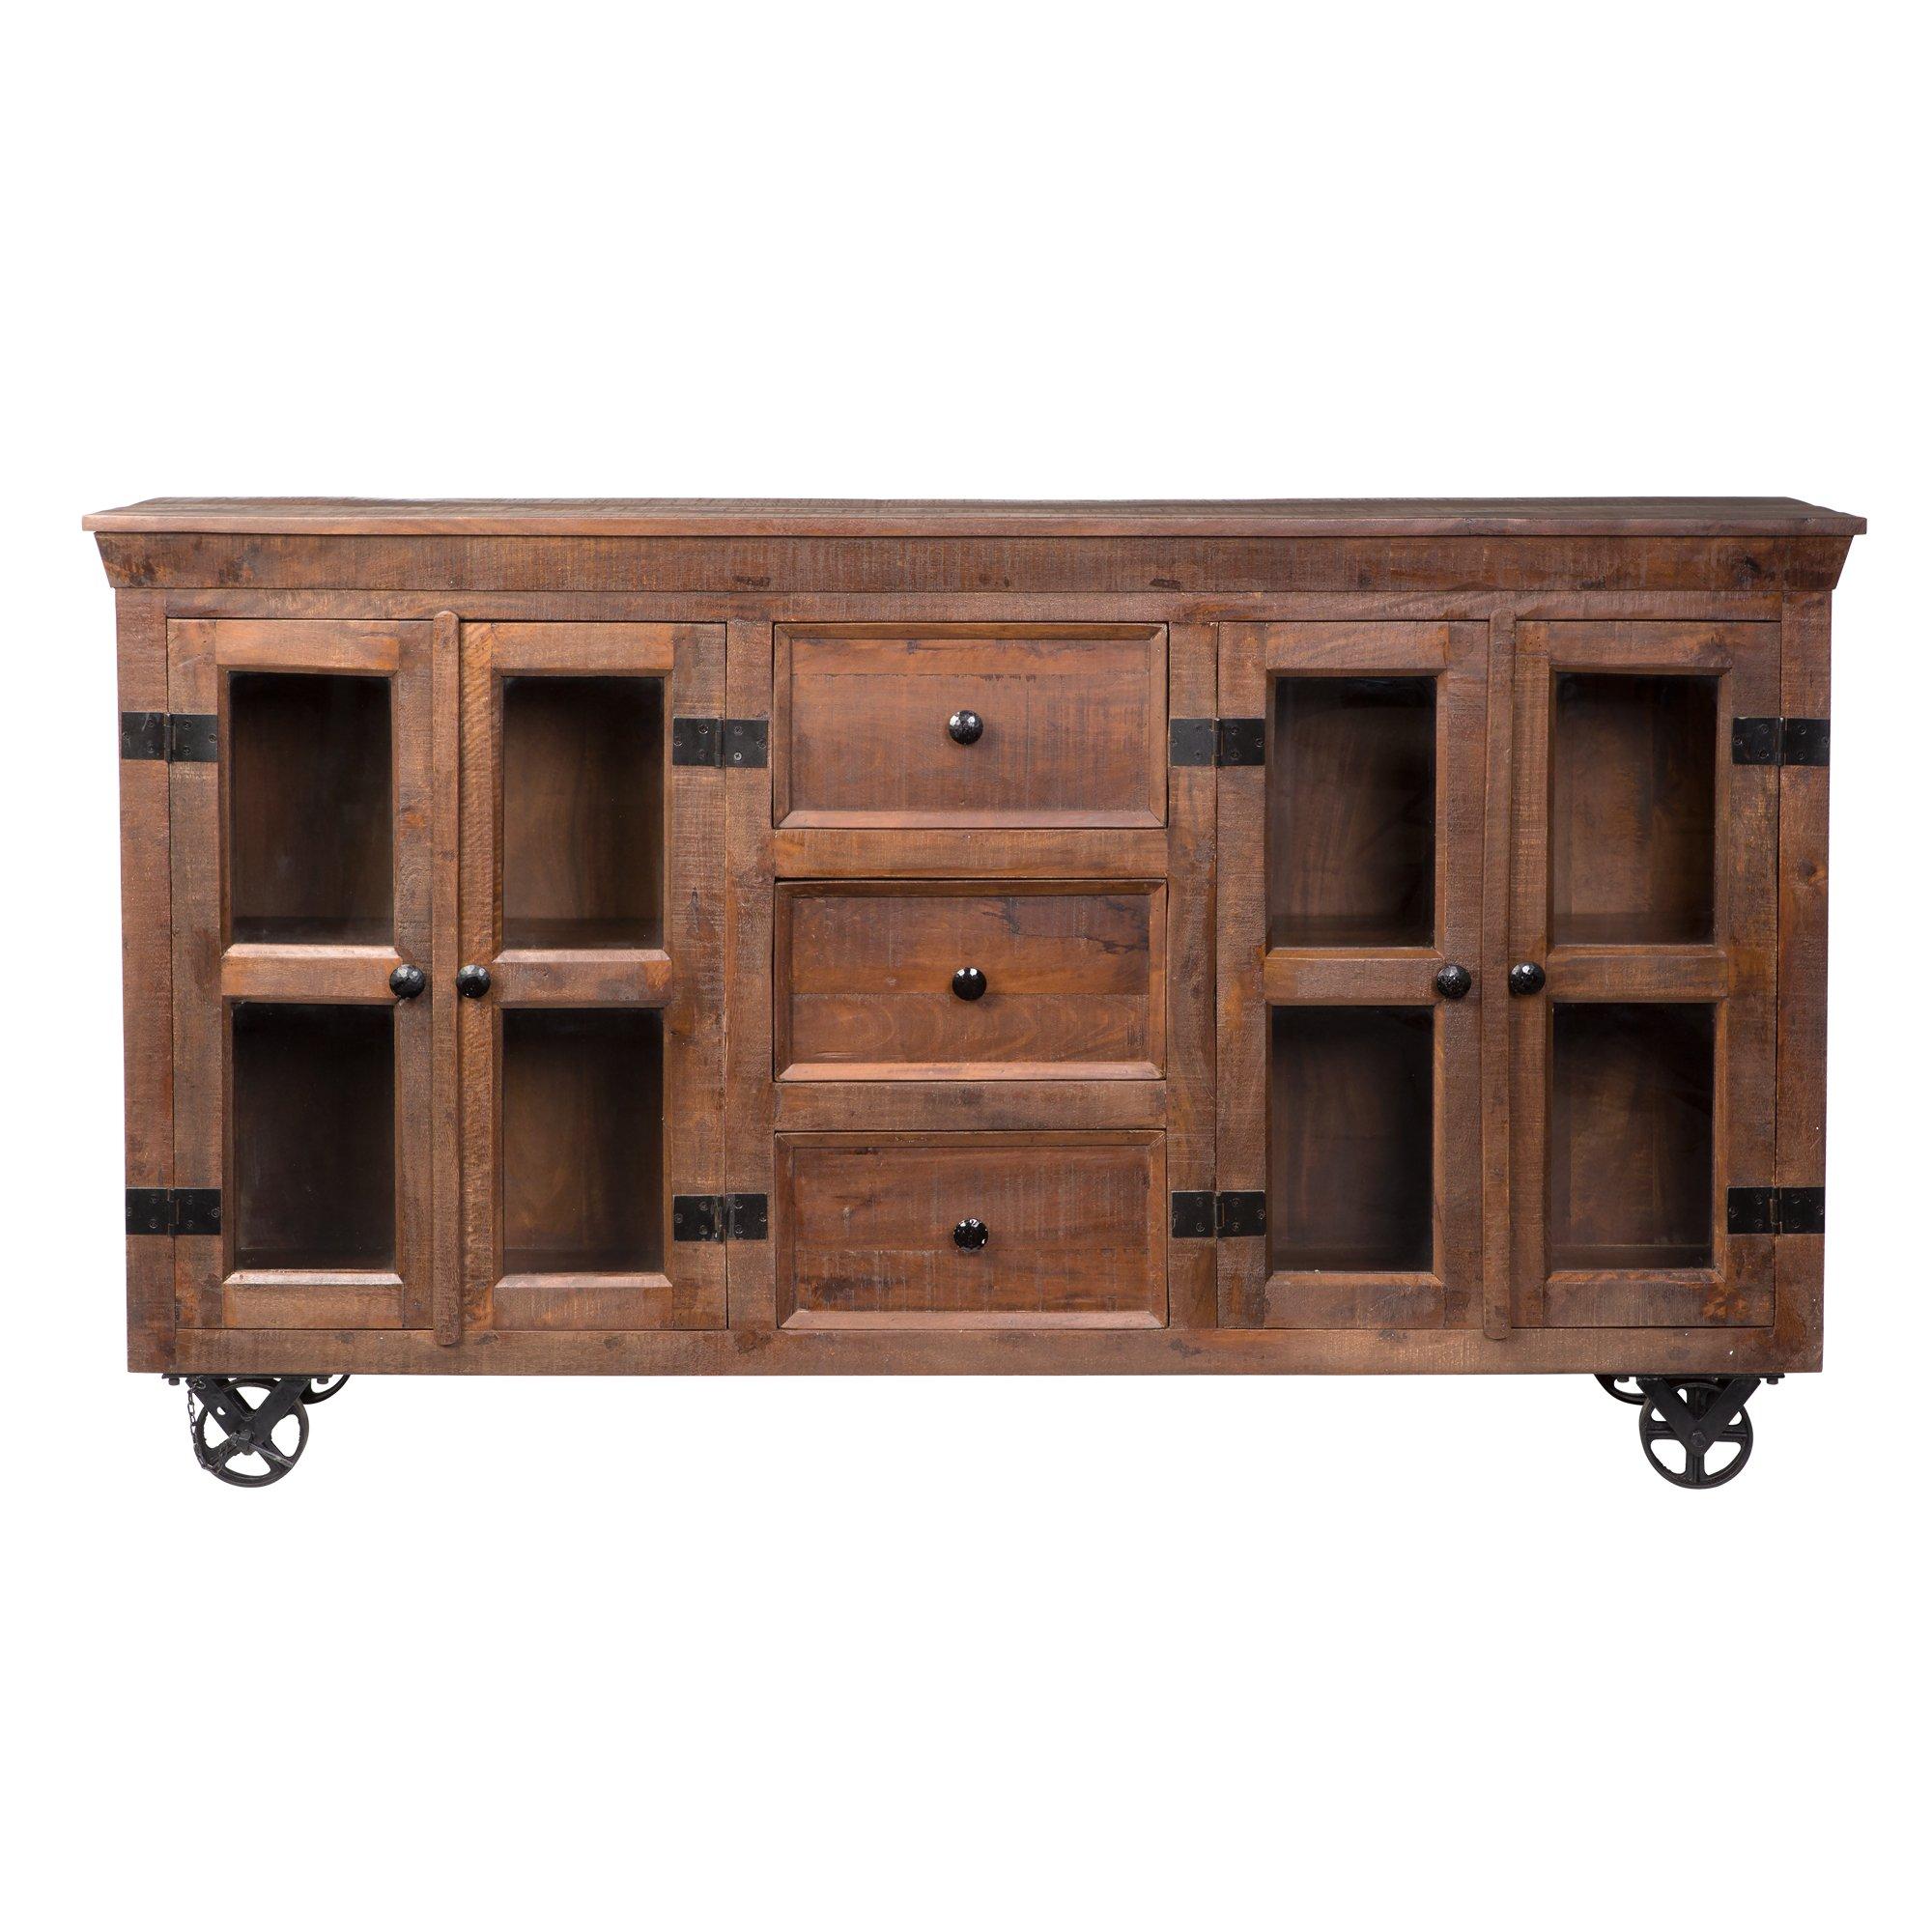 Yosemite Home Decor YFUR-VA7040 Storage/Display Cabinet, Brown